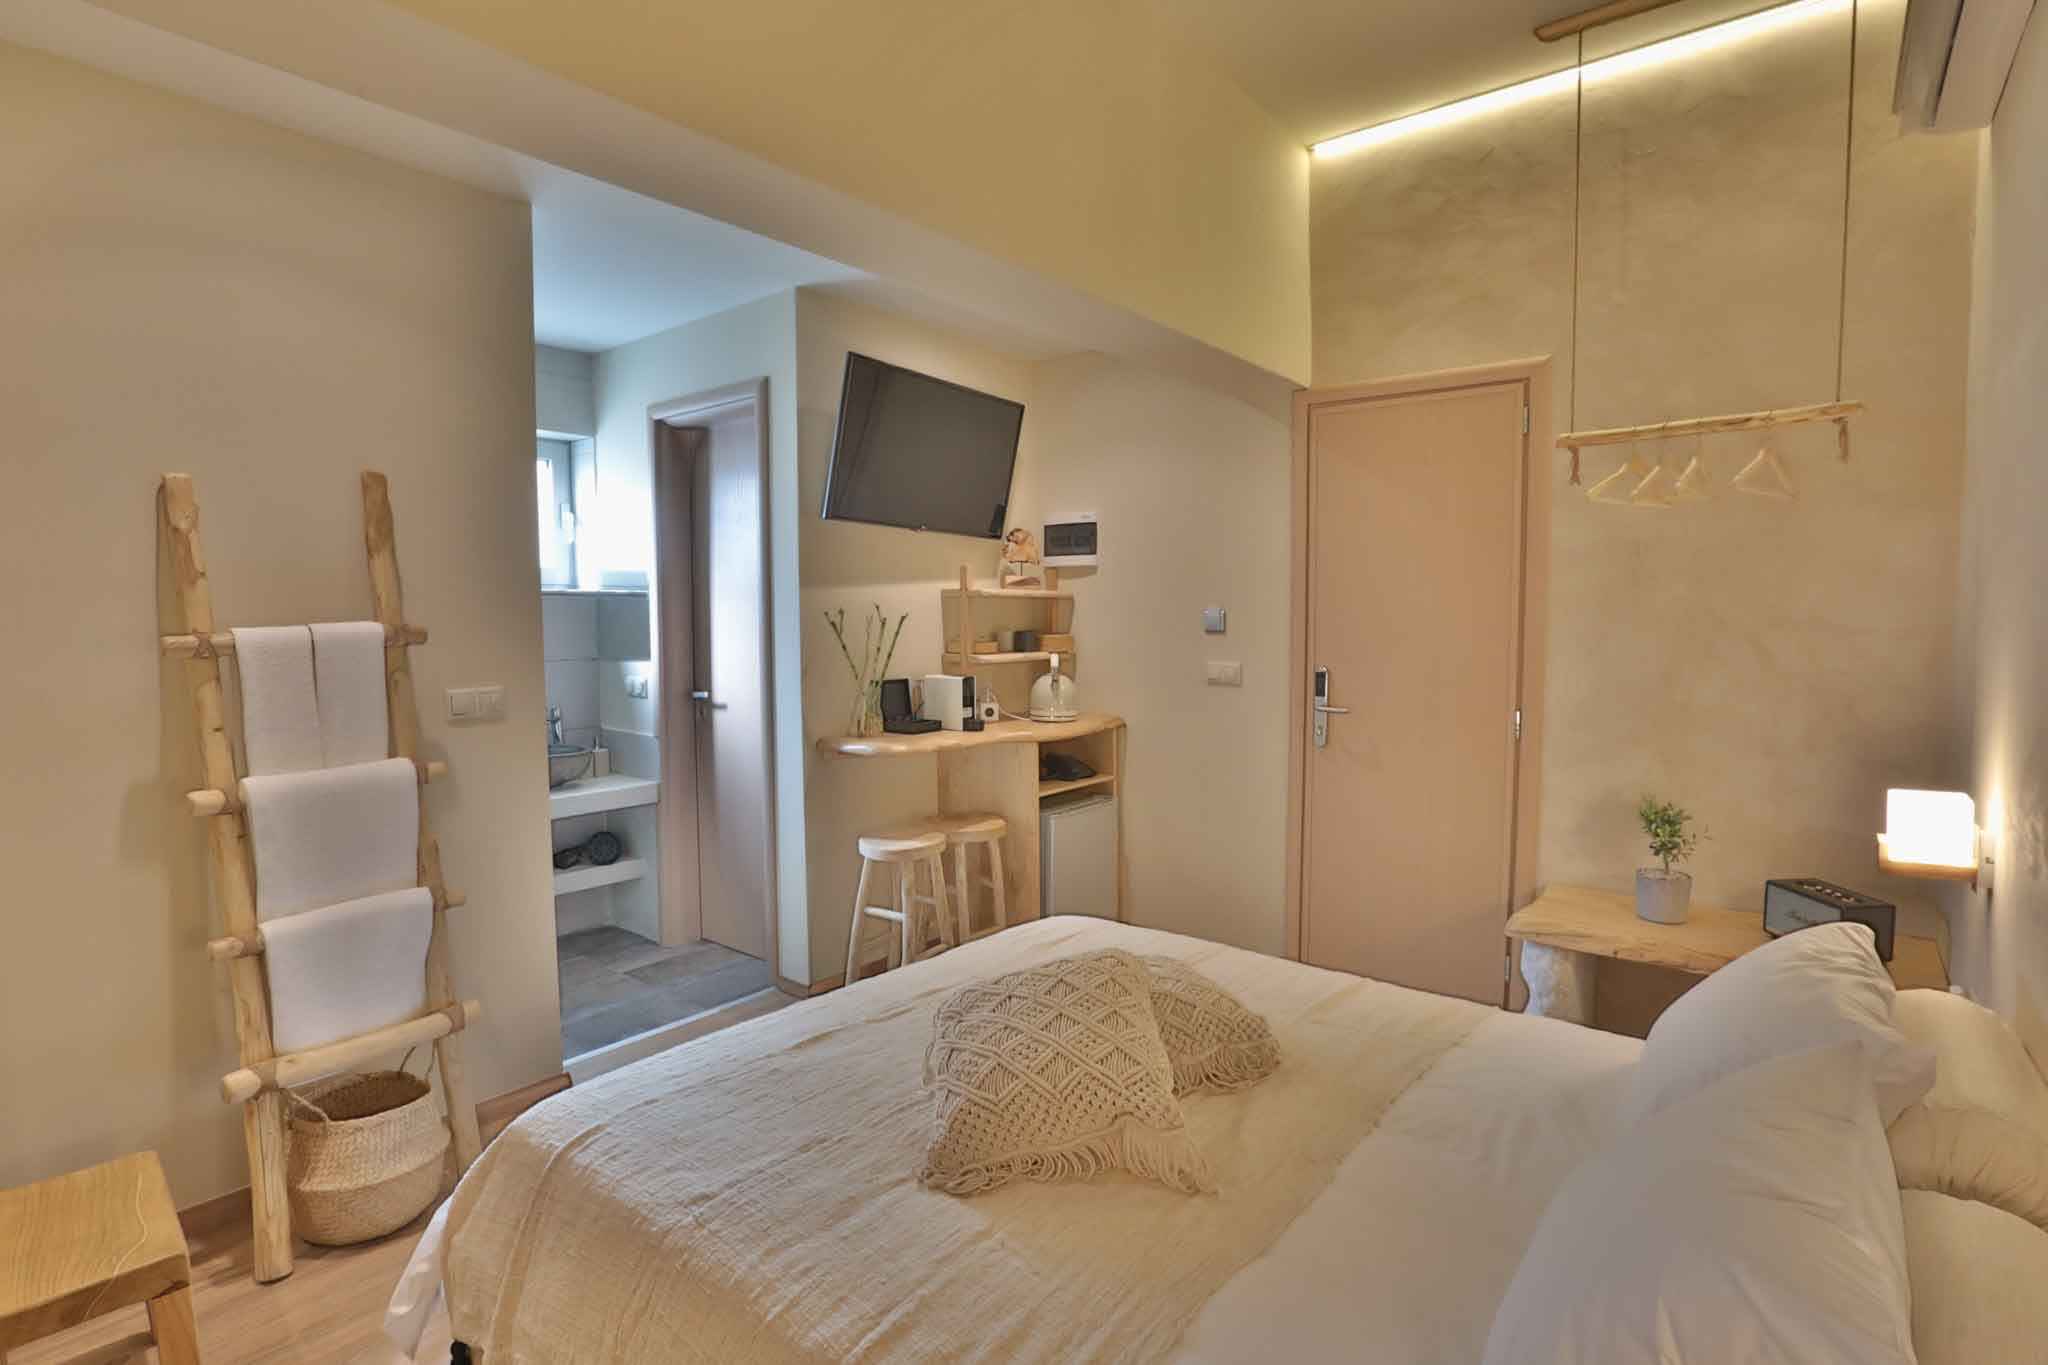 Hotel_room_Luna_02